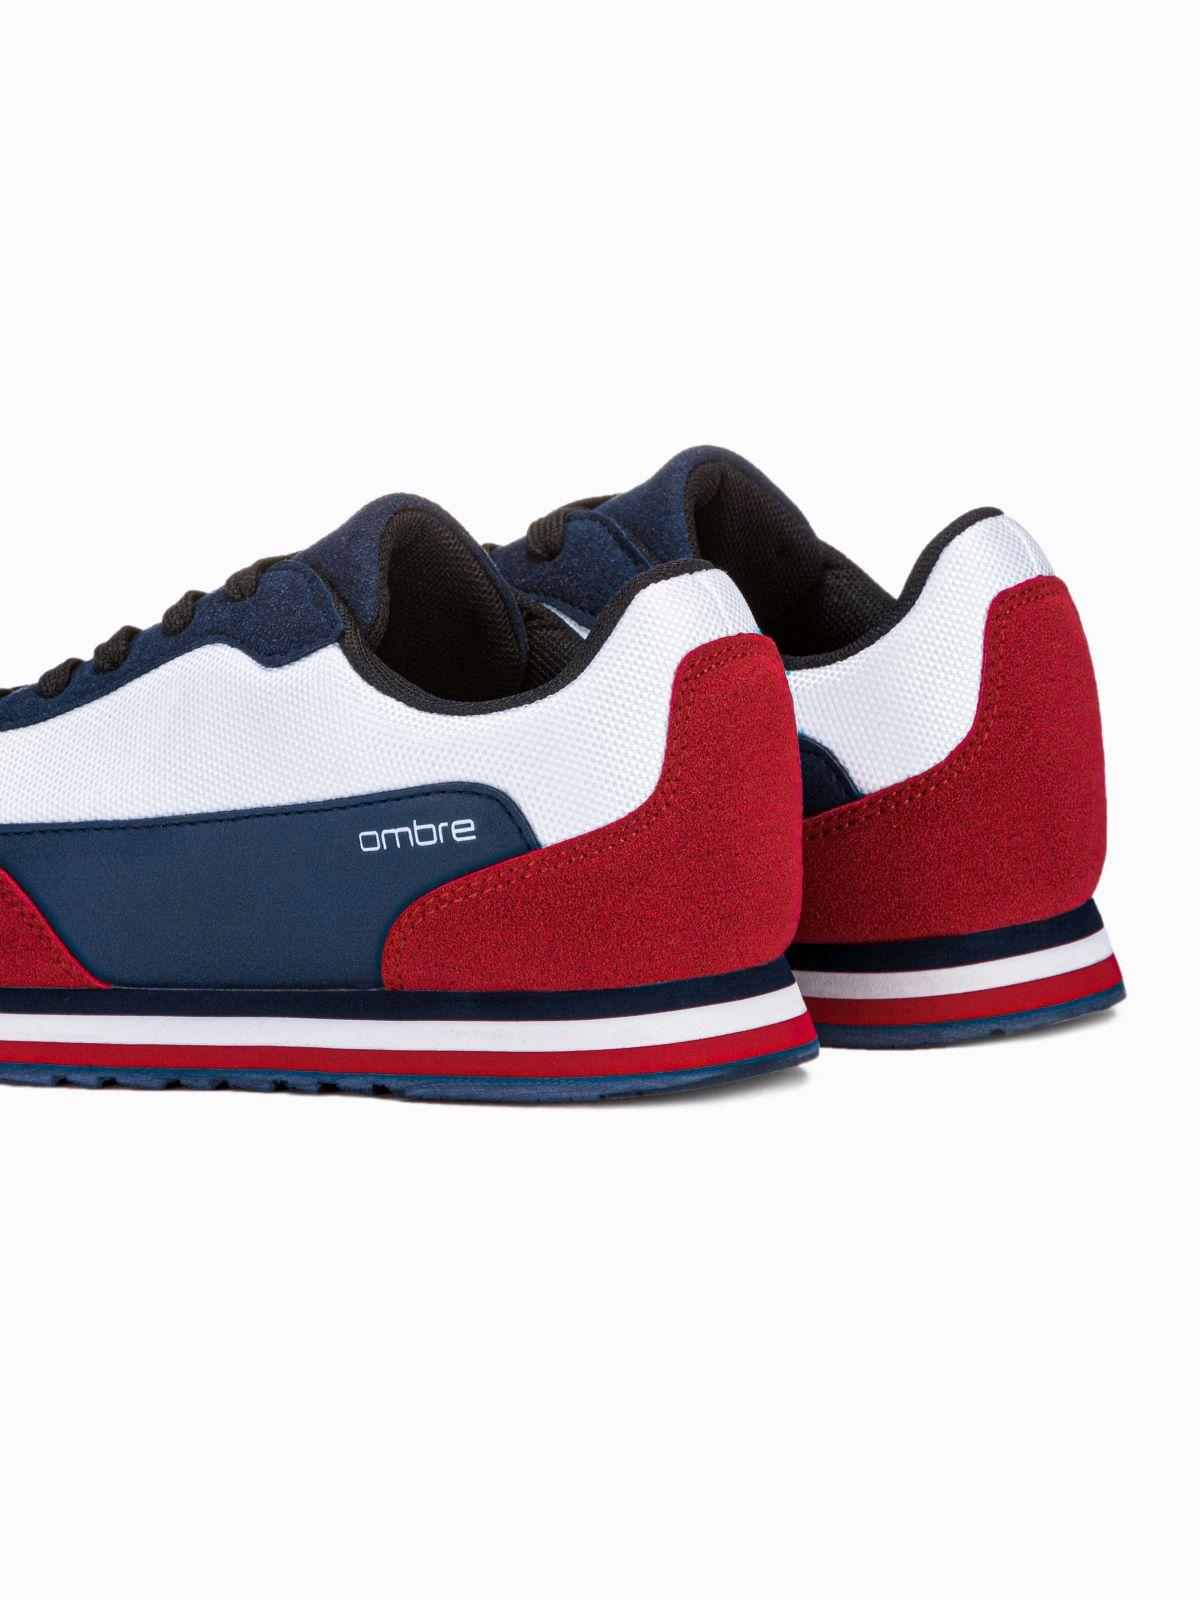 Buty Meskie Sneakersy T349 Granatowe Sklep Ombre Pl